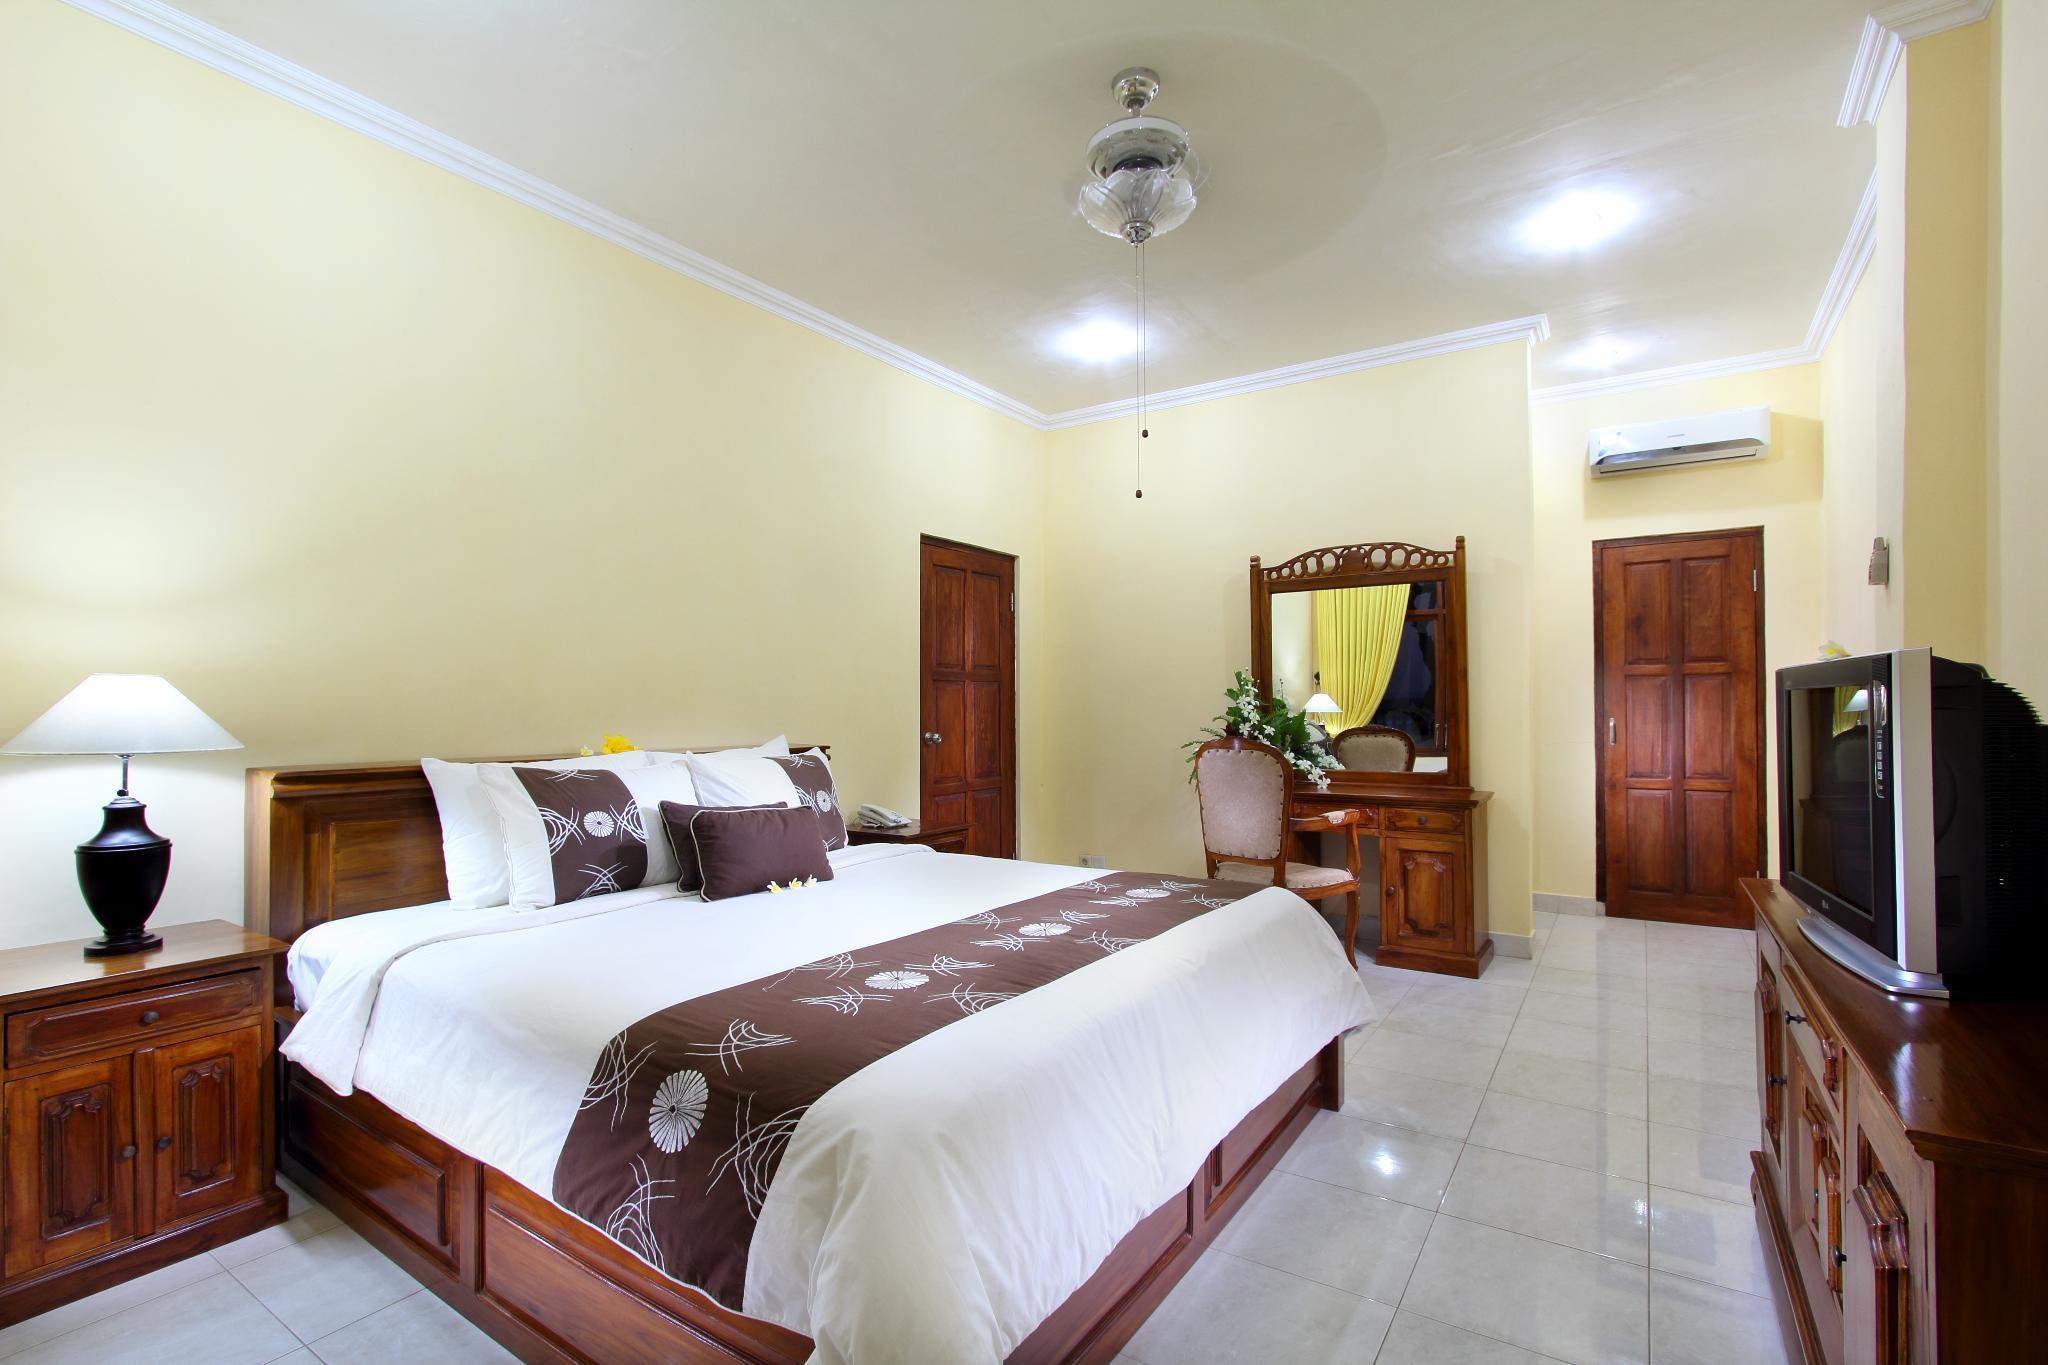 Double one bedroom